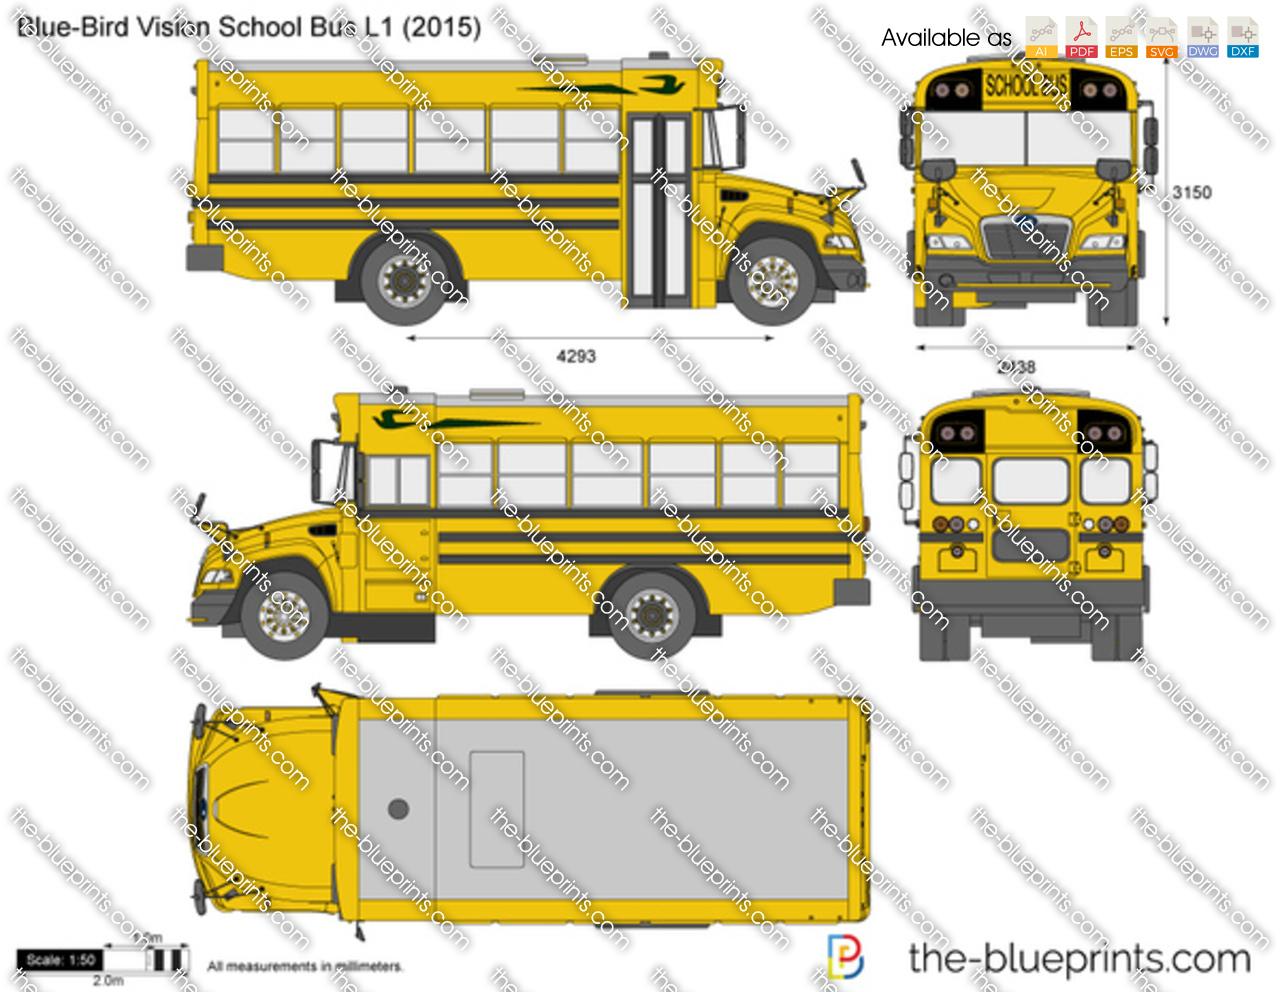 Blue-Bird Vision School Bus L1 2017